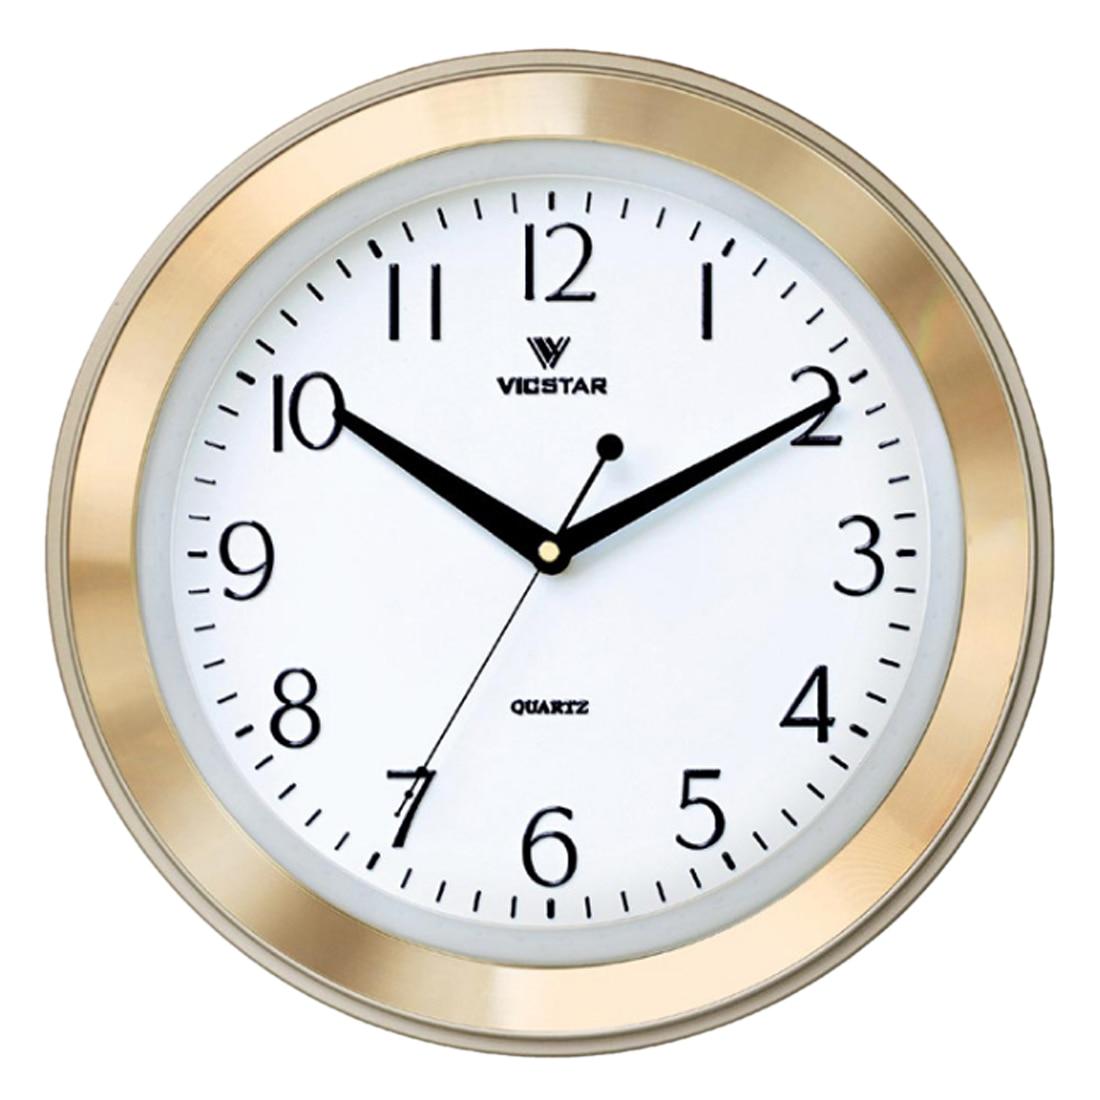 33Cm Brief Wall Clock Modern Silent Clocks Aluminum Frame Quartz Slient Clock Wall Clocks Home Decor - Silver Golden